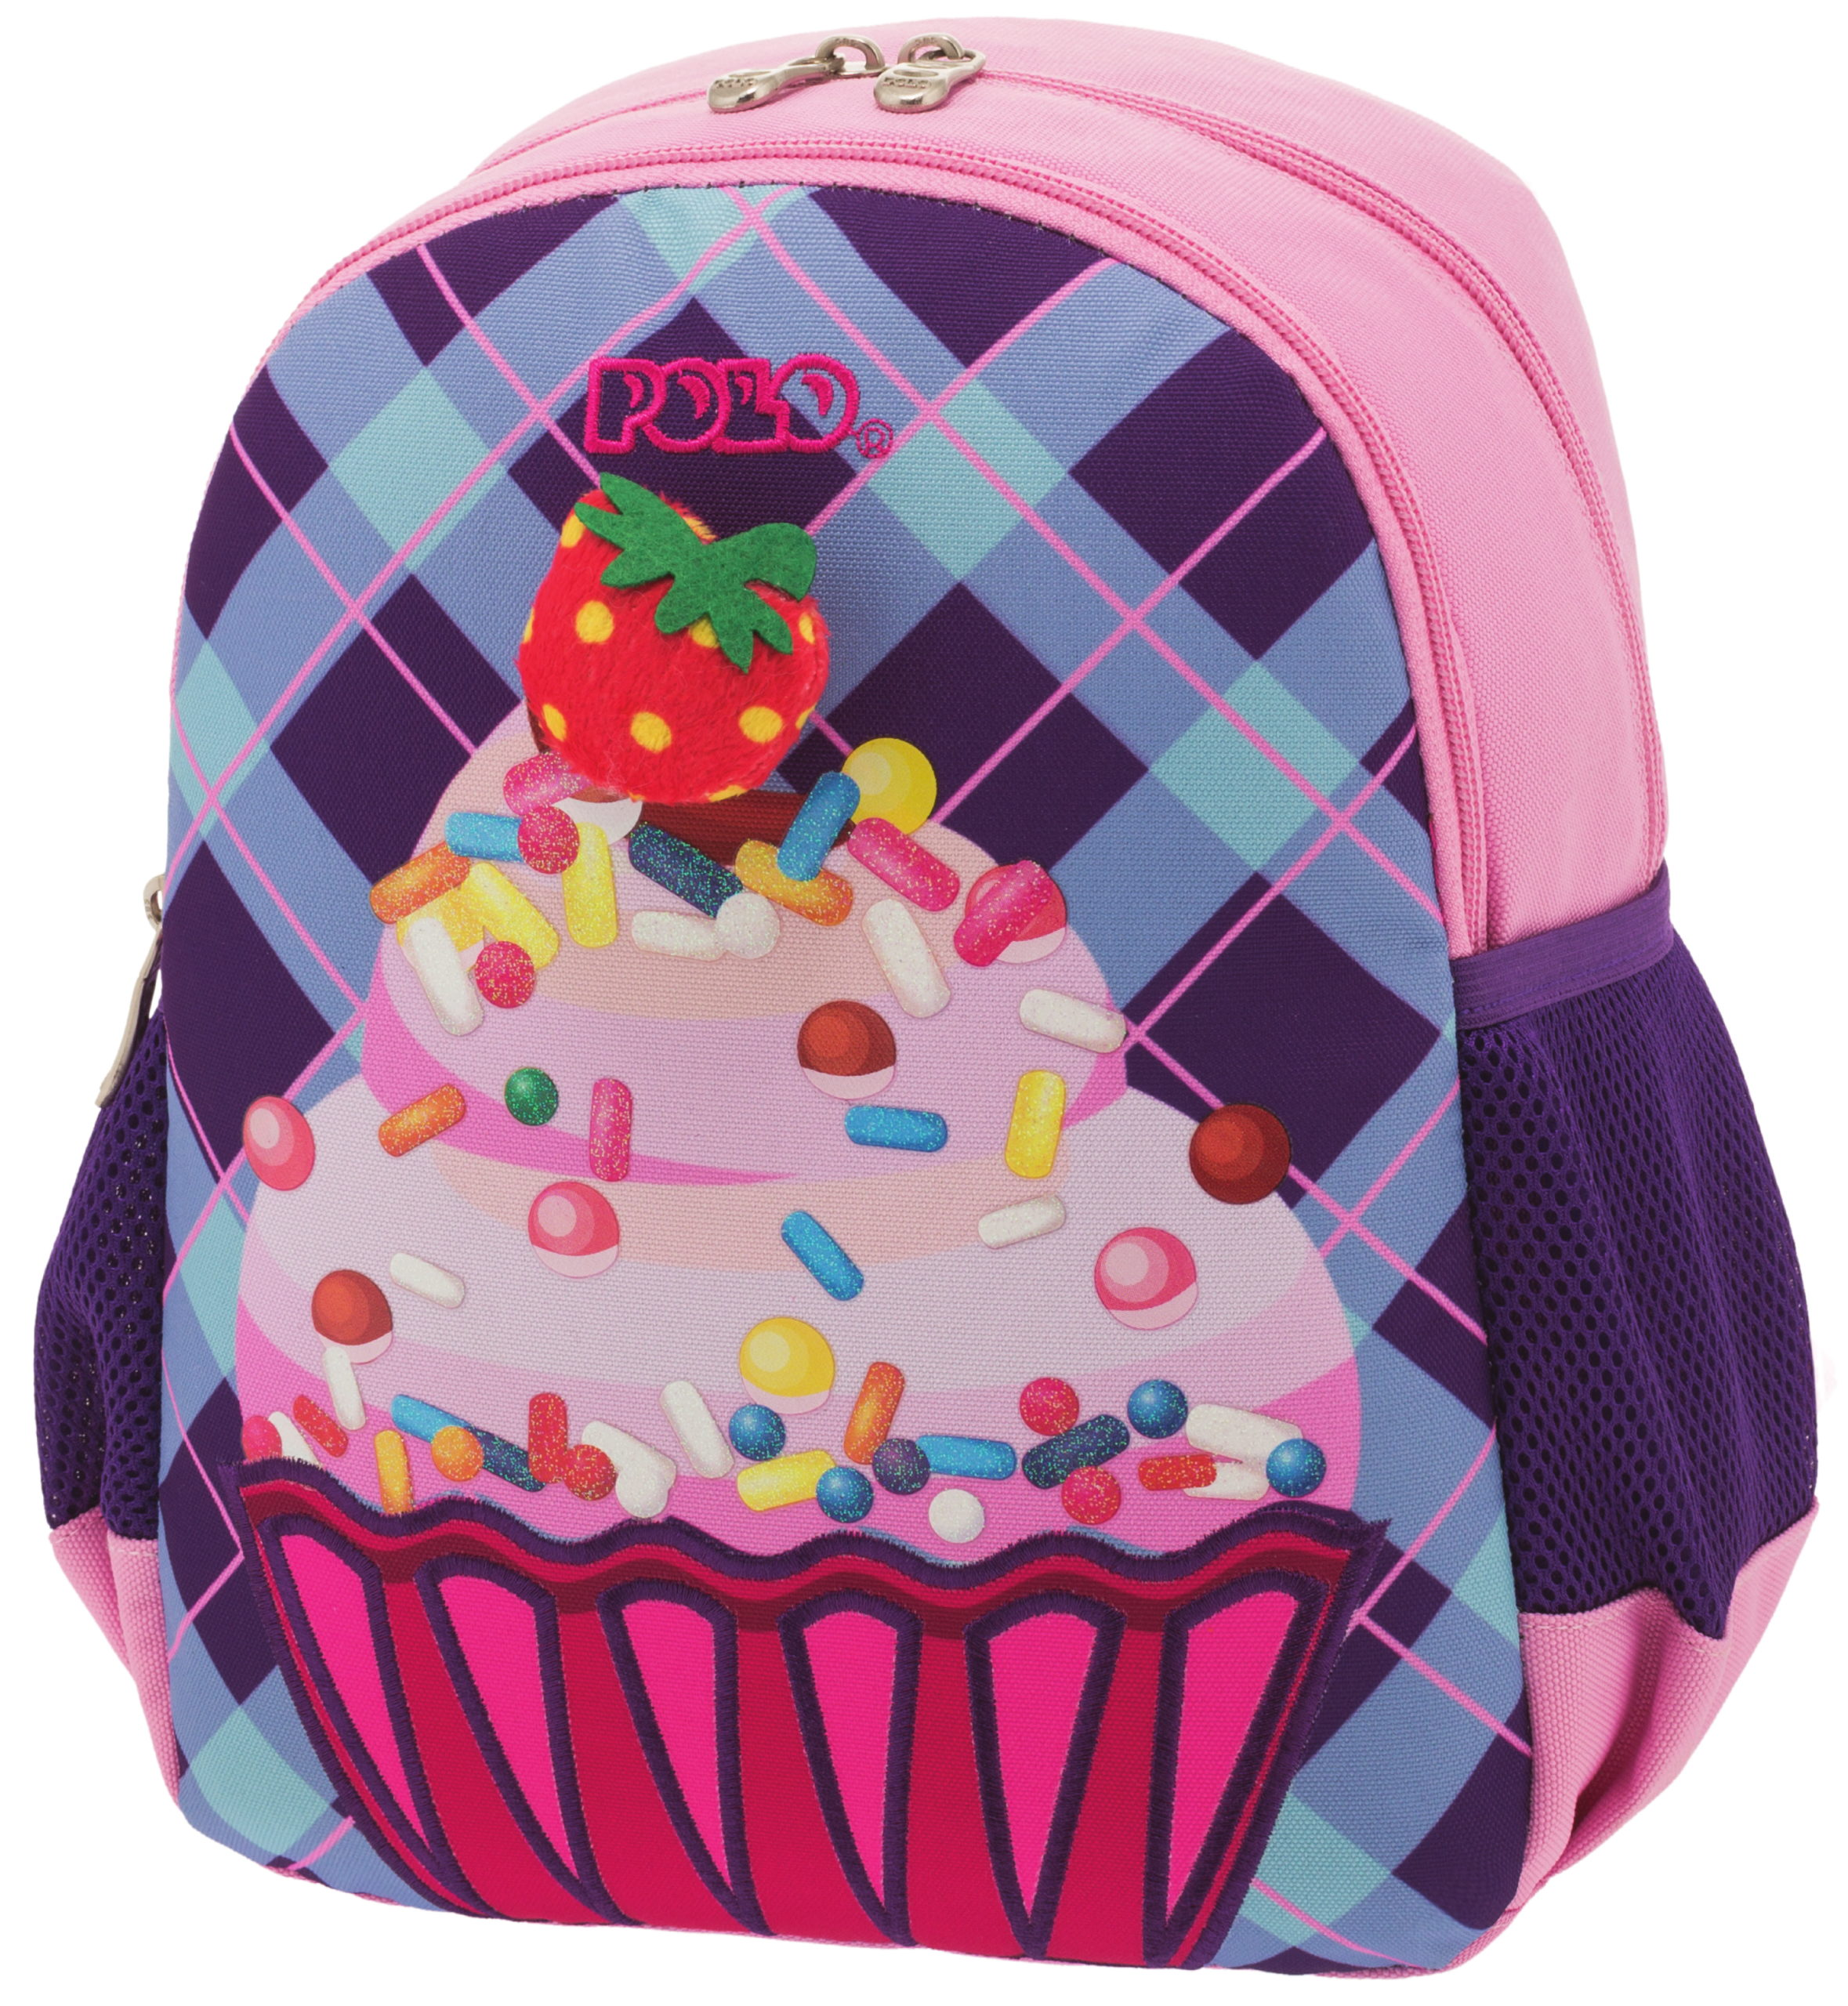 Cupcake Animal Junior σακίδιο πλάτης Polo – 9-01-014-64